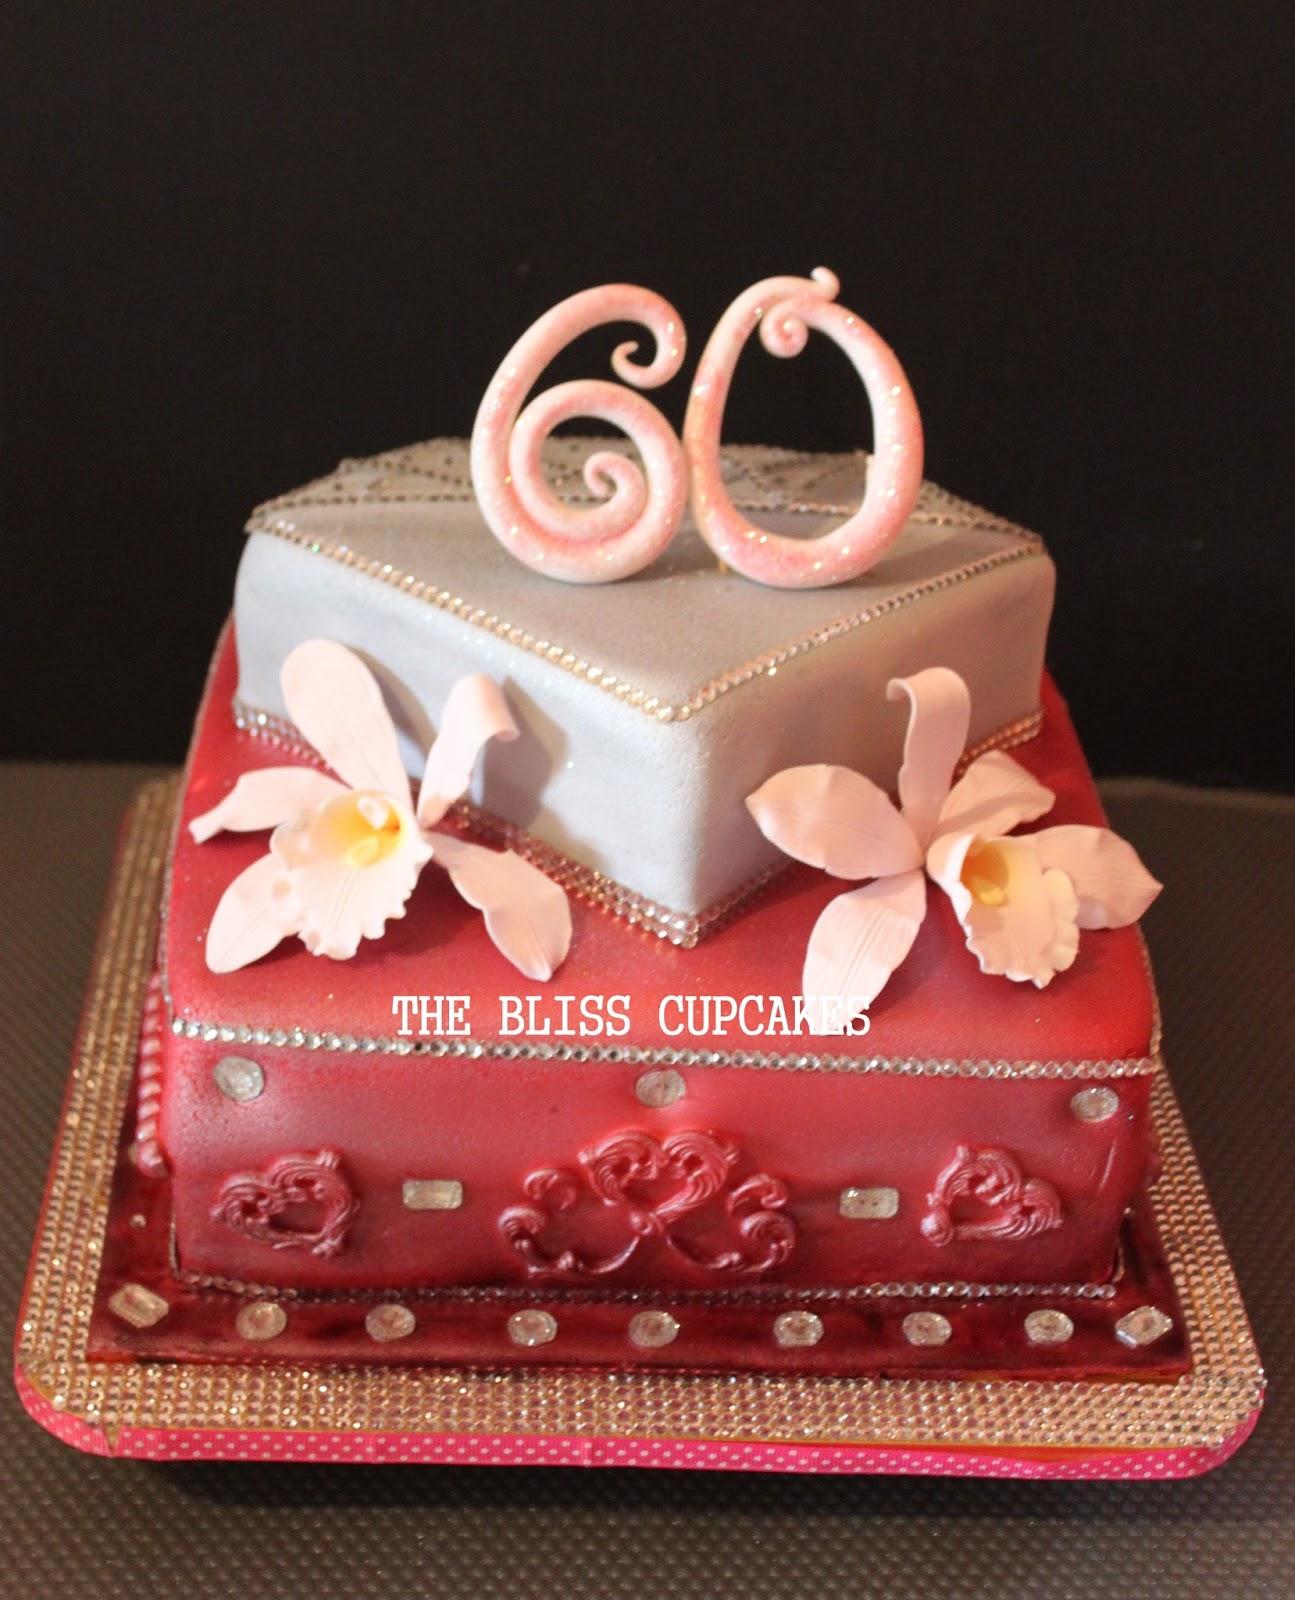 The Bliss Cupcakes 60th Bling Bling Birthday Cake